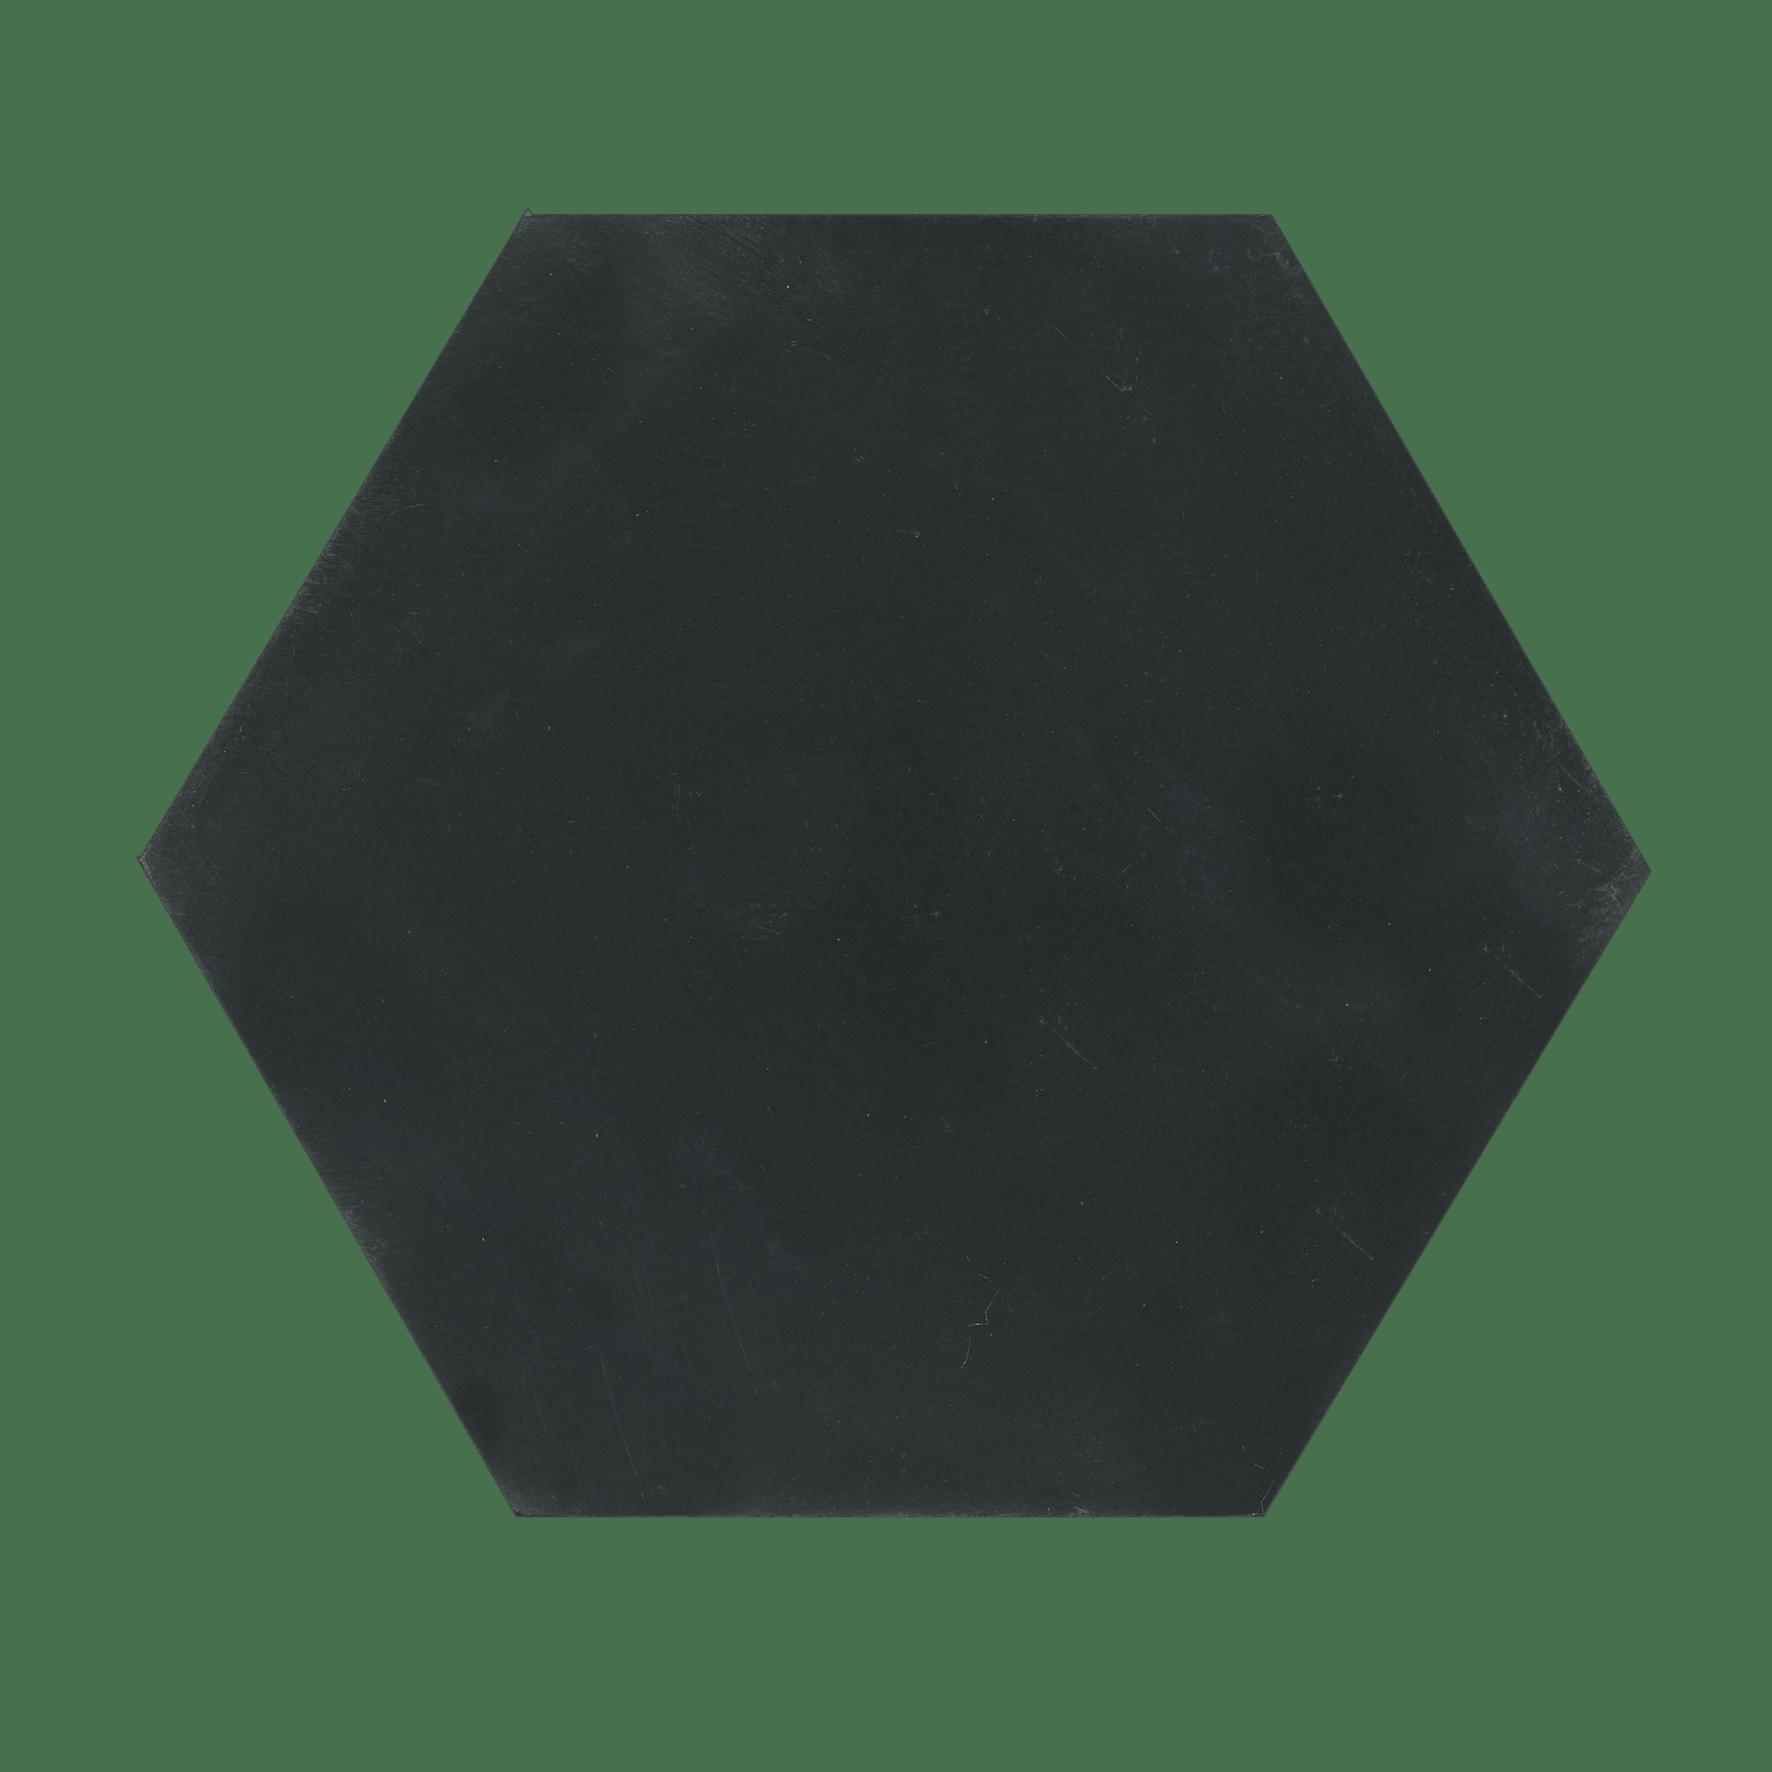 zementfliesen-terrazzofliesen-kreidefarbe-terrazzo-fugenlos-viaplatten-6-60 | 6-60